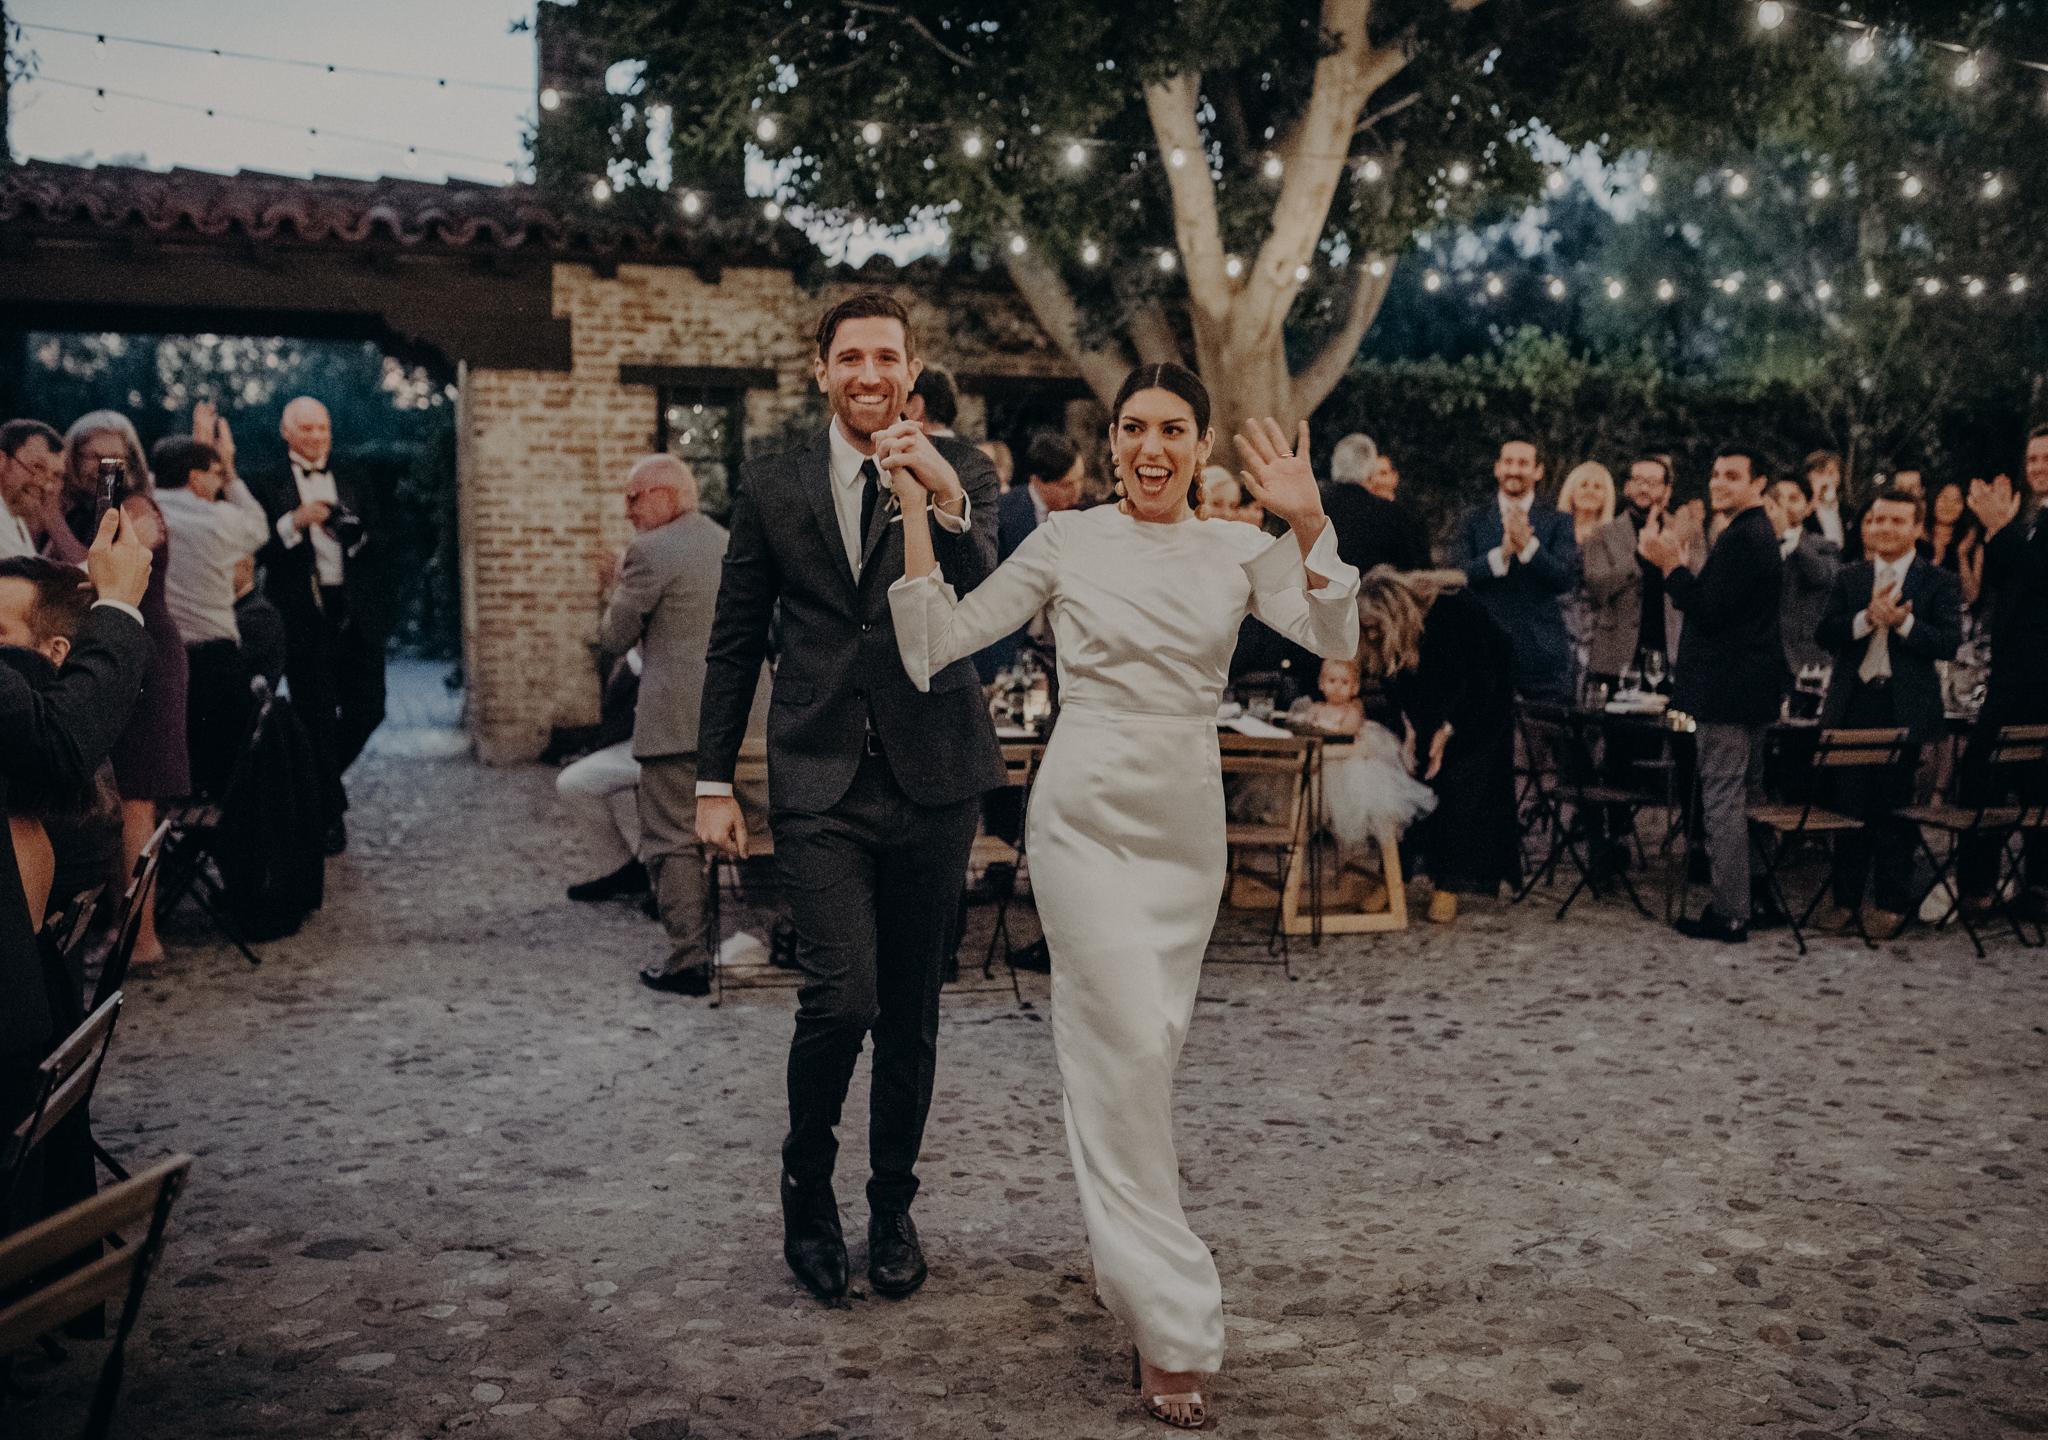 Hummingbird Nest Ranch Wedding - Wedding Photographer in Los Angeles - IsaiahAndTaylor.com-089.jpg